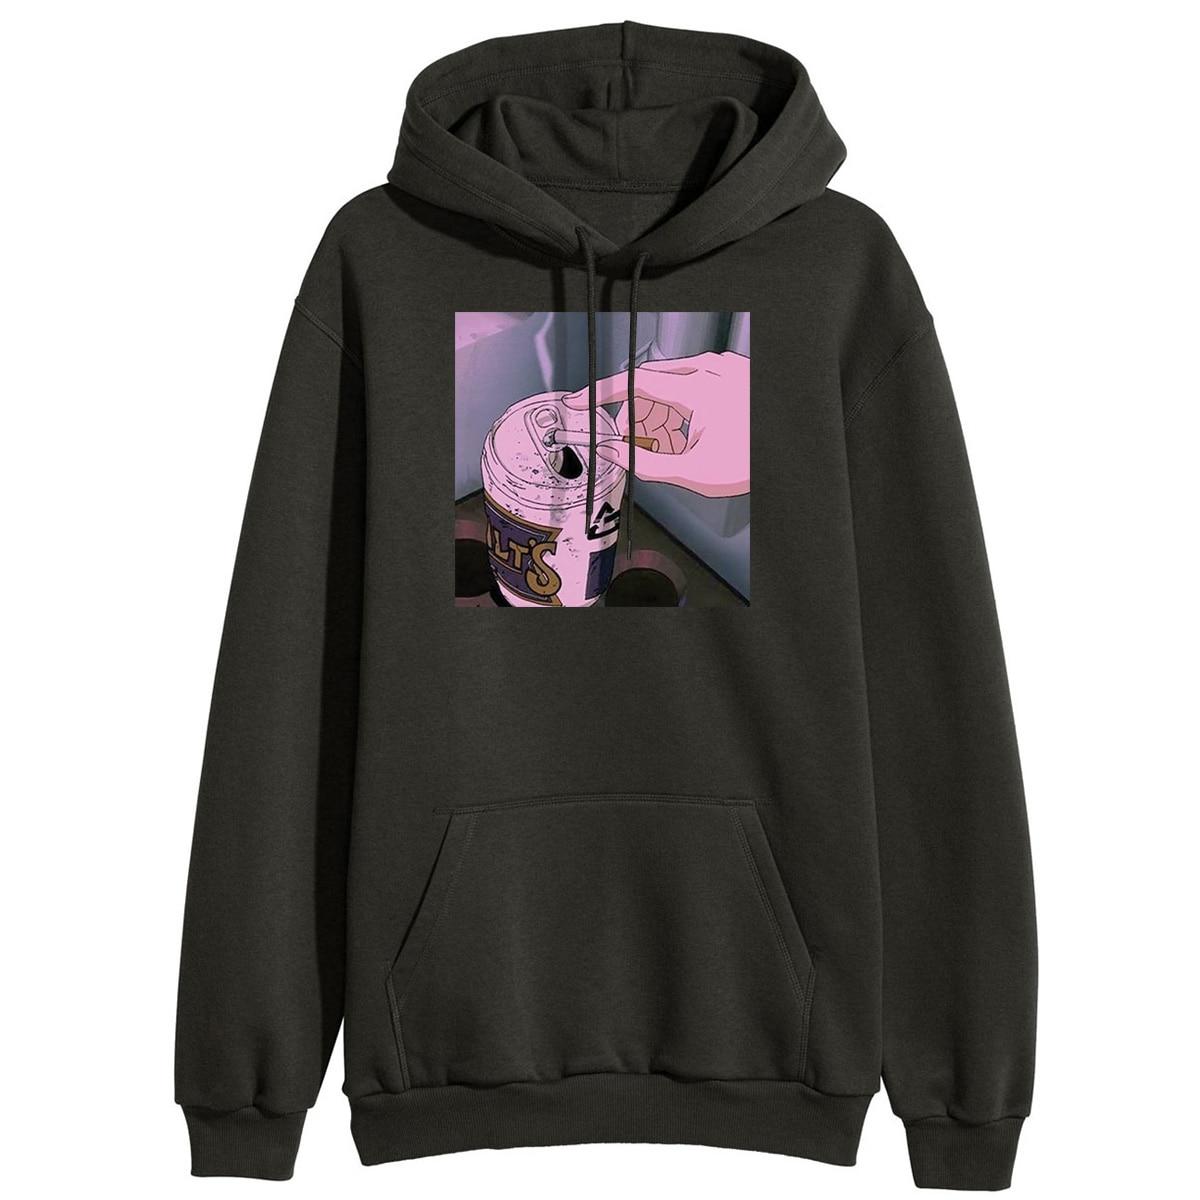 Sad Anime Vaporwave Hoodie Women Winter Hooded Sweatshirts Aesthetic Japan Otaku Hoodie Casual Sweatshirt Fleece Pullover